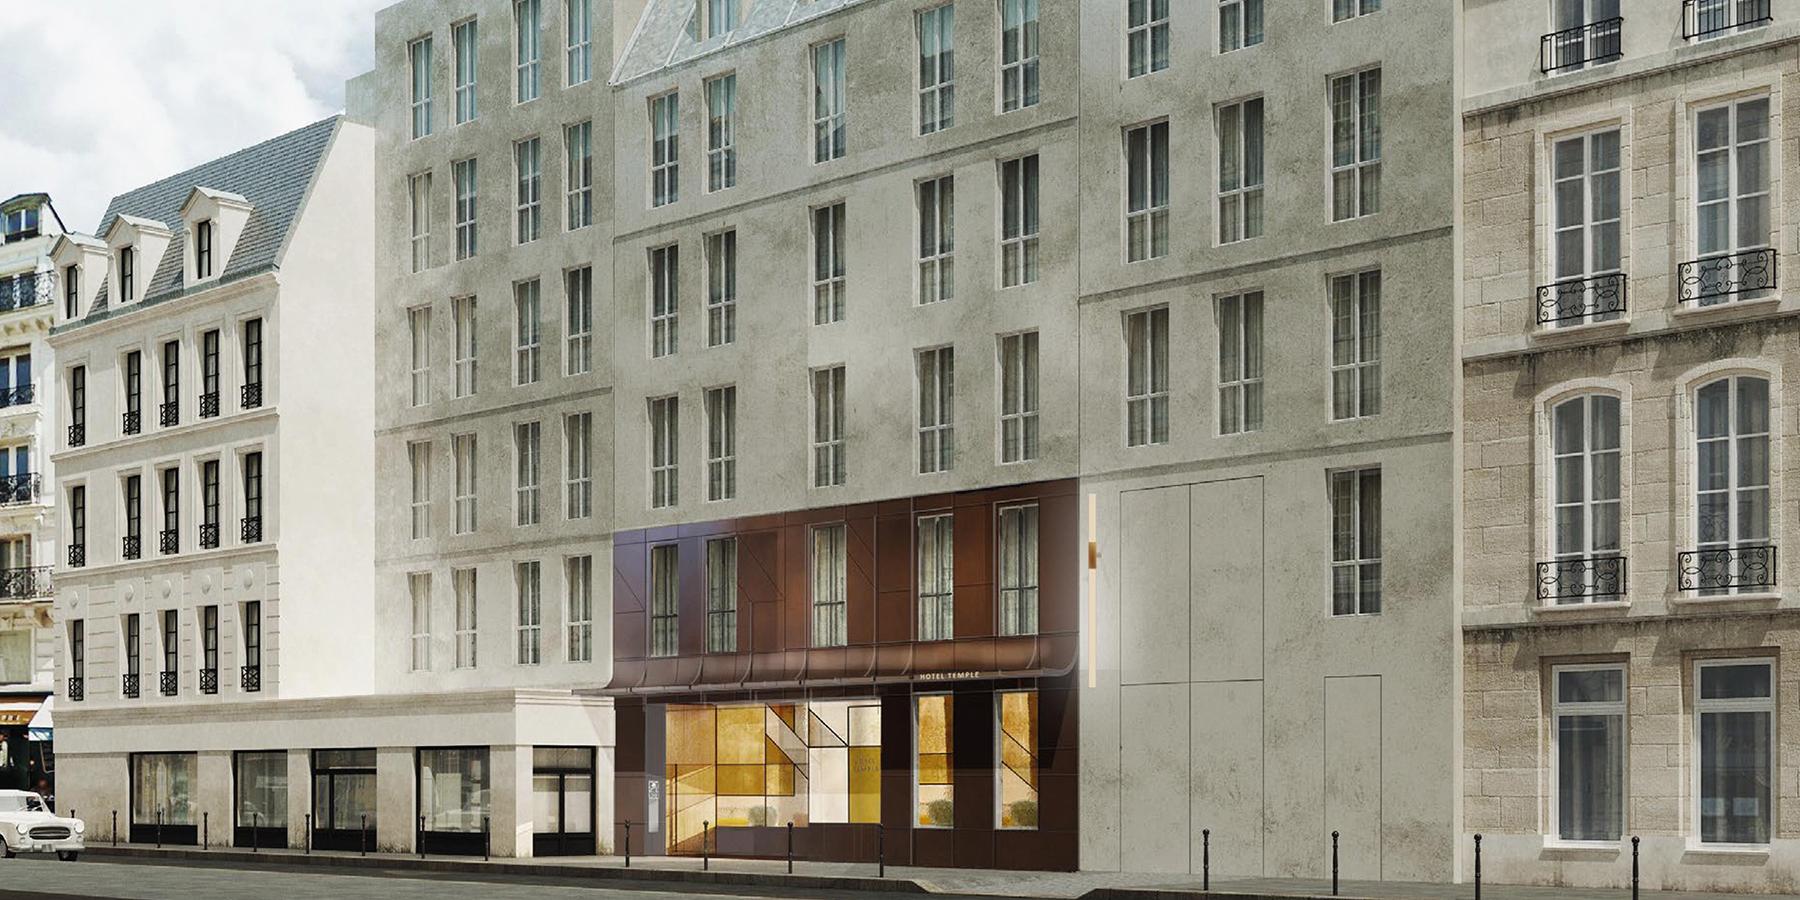 Hôtels Paris : Façade de l'hôtel Sinner